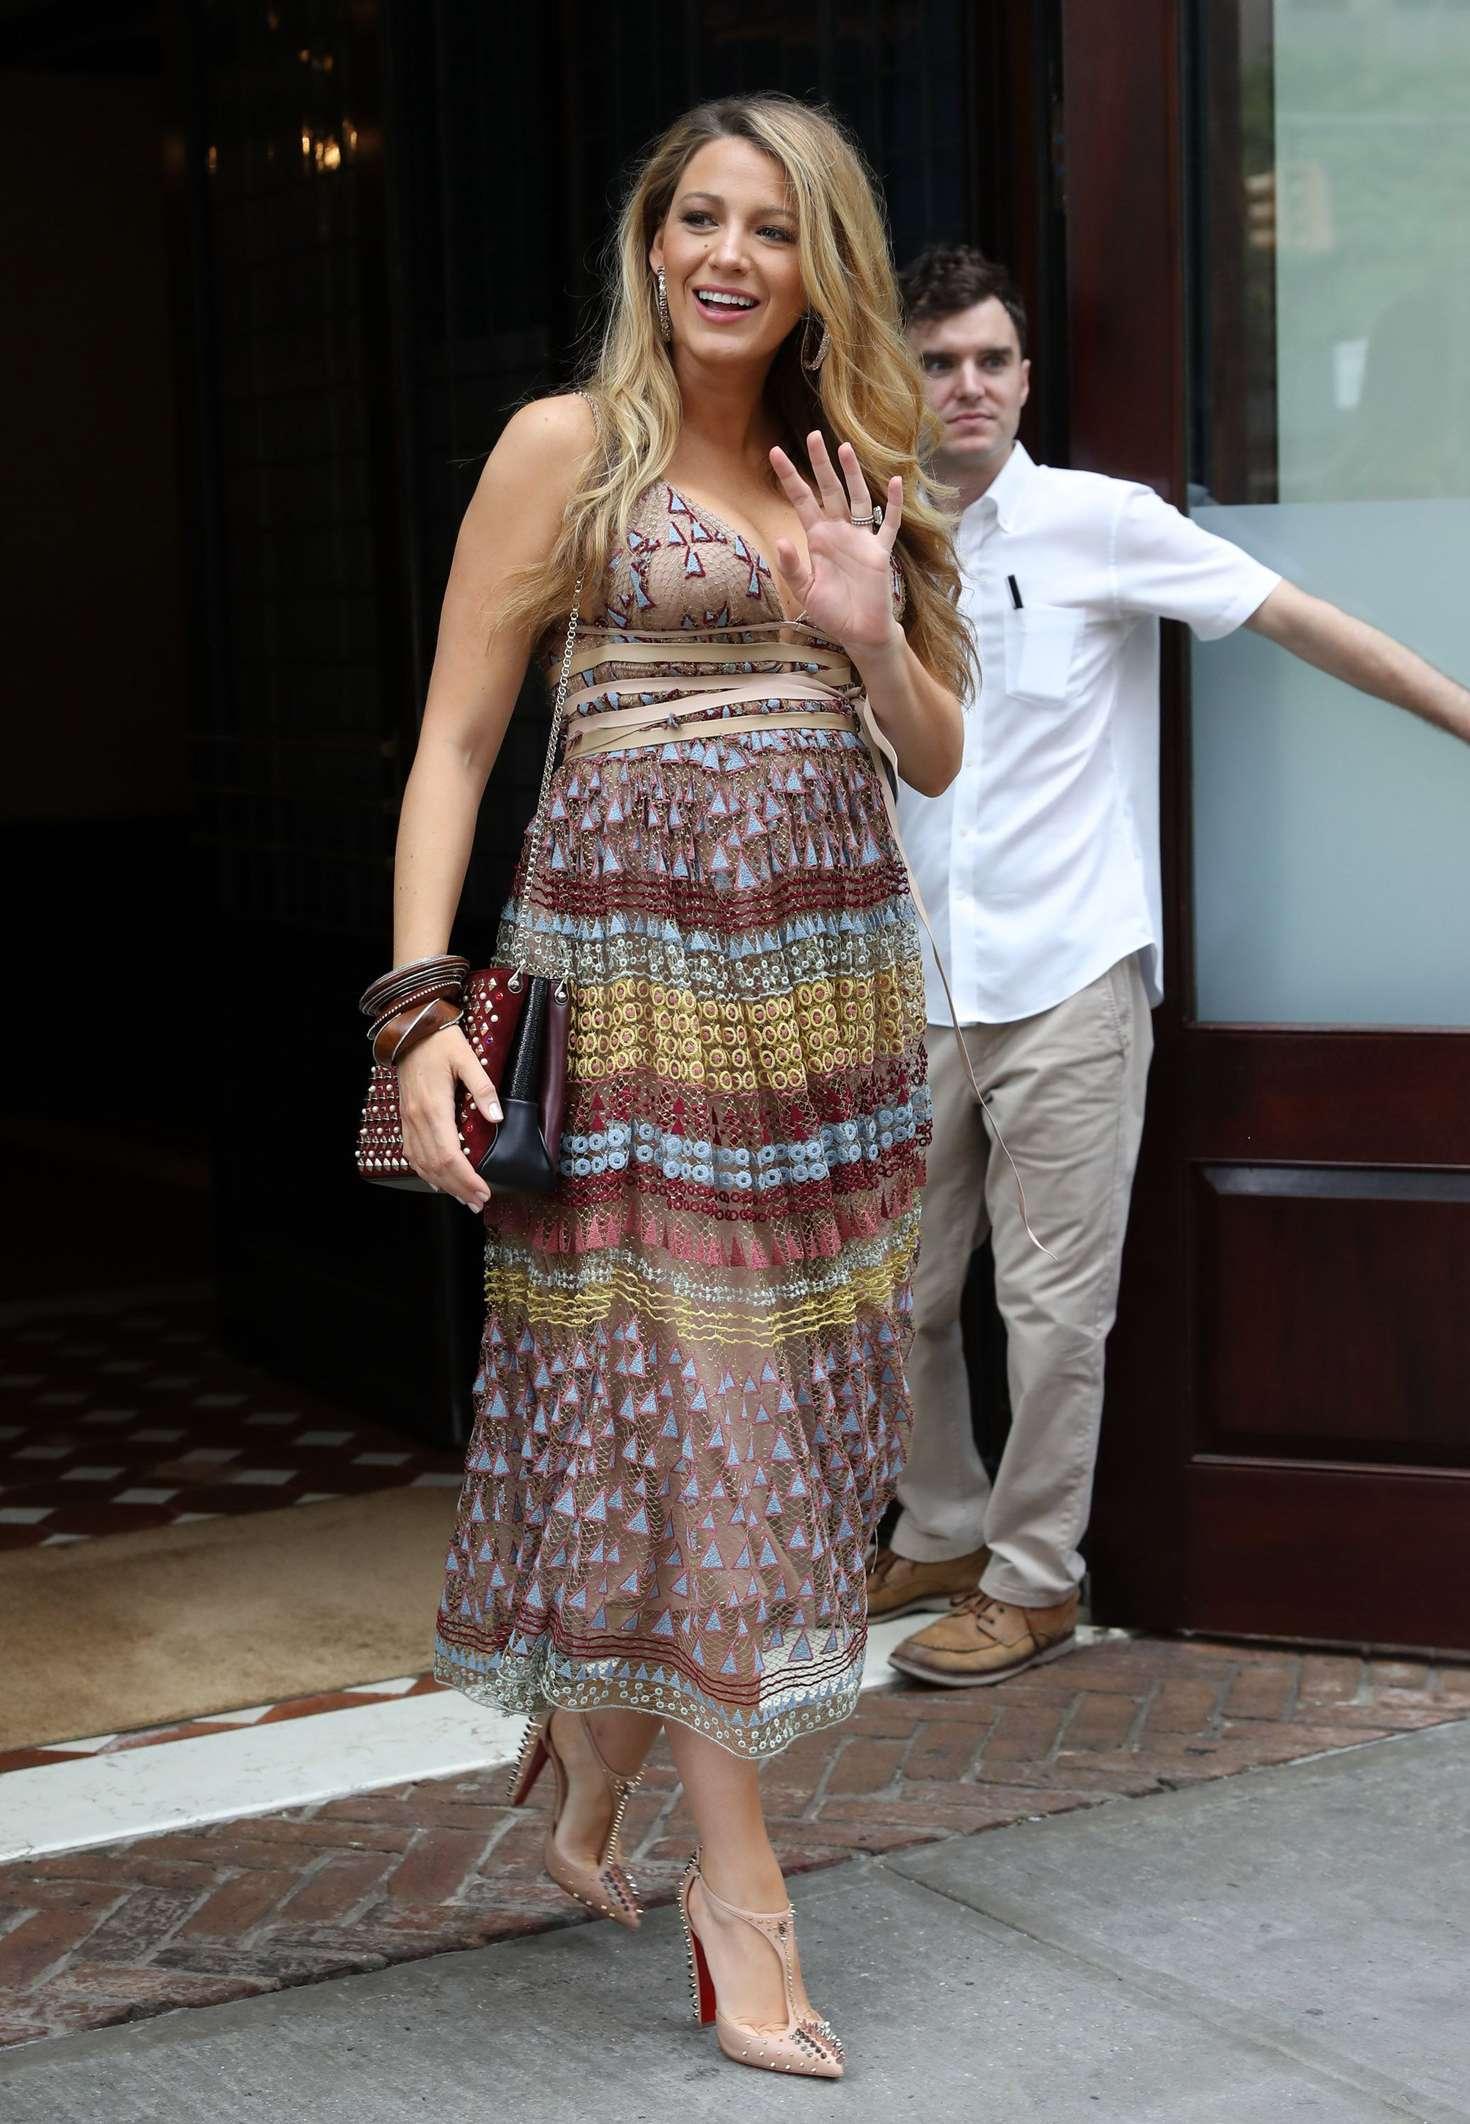 Blake Lively In Summer Dress -19 - GotCeleb